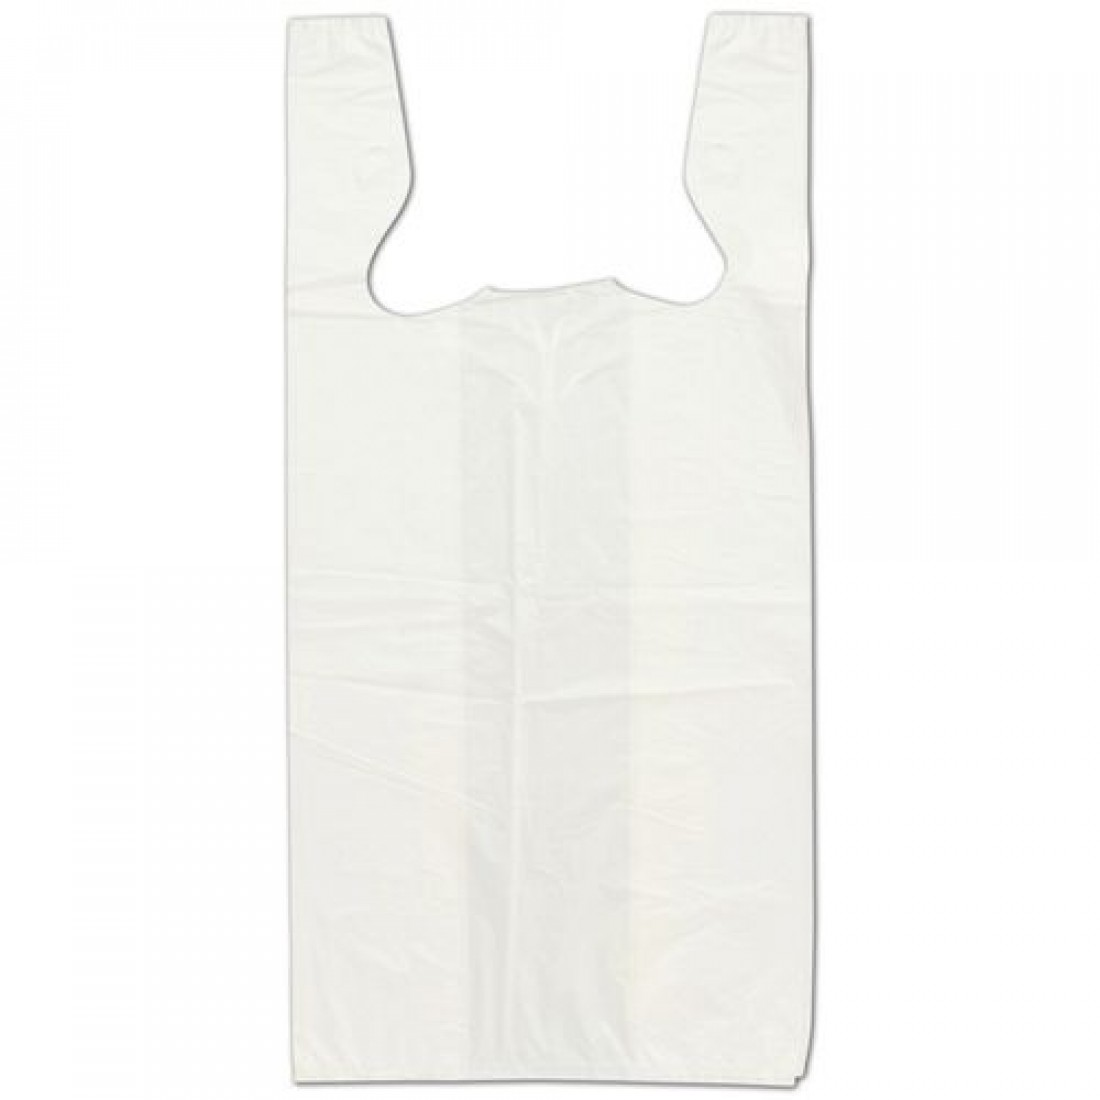 White T-Shirt Bags 11.5x7x23